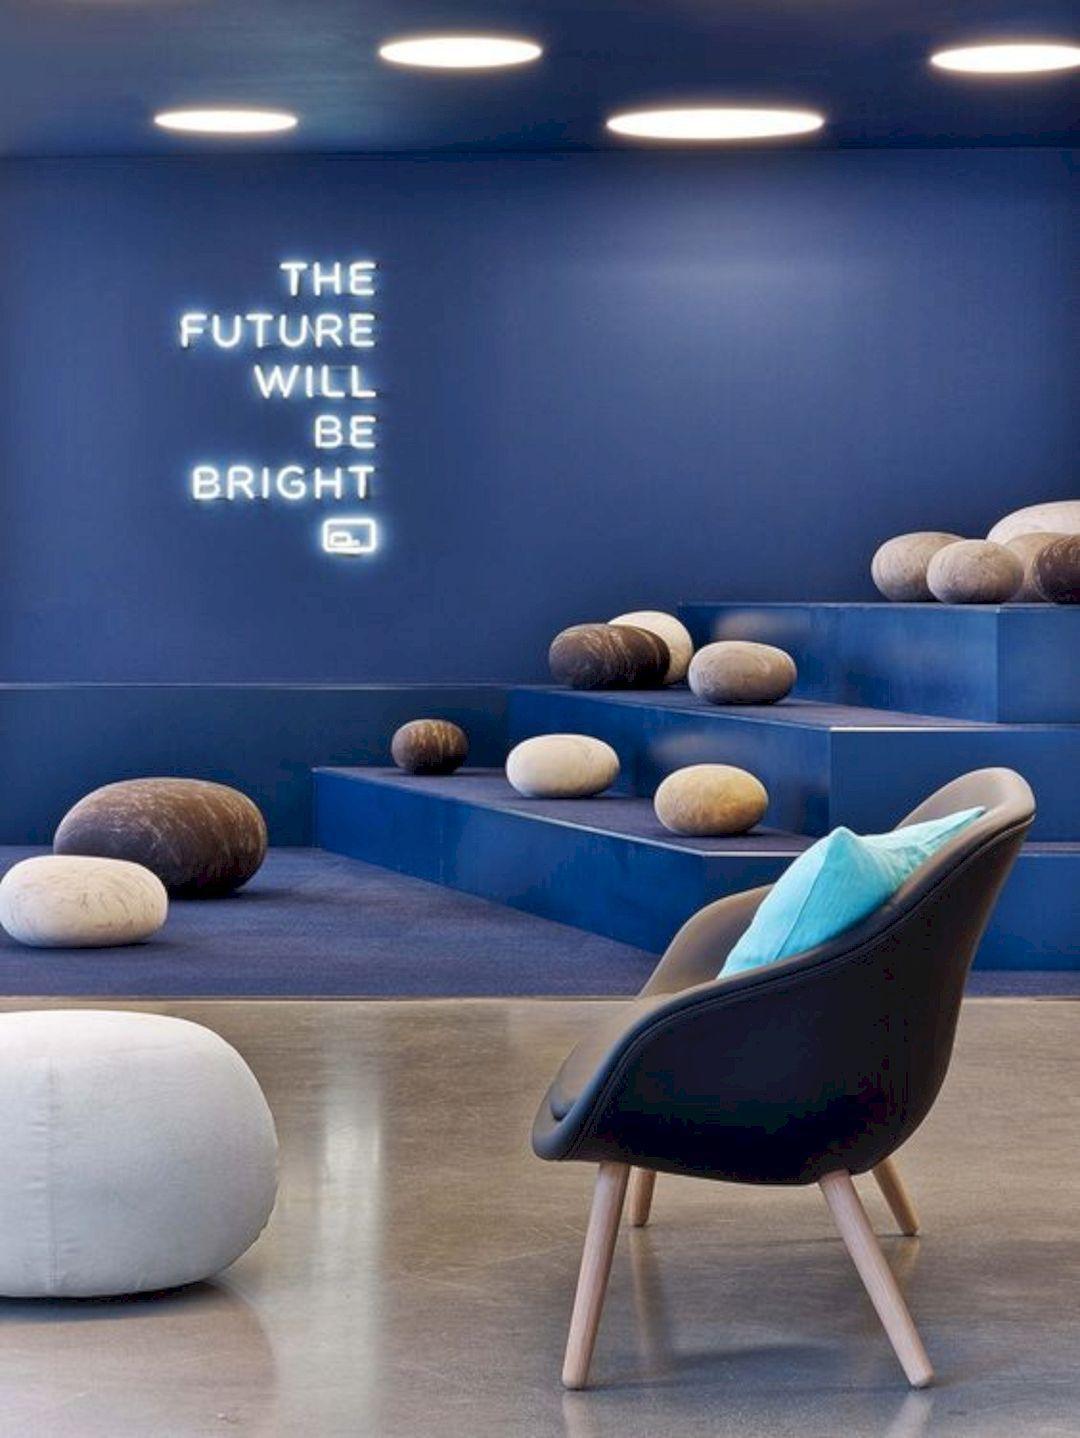 5 Ideas To Upgrade Your Classroom Design Office Interior Design Office Space Design Modern Office Design